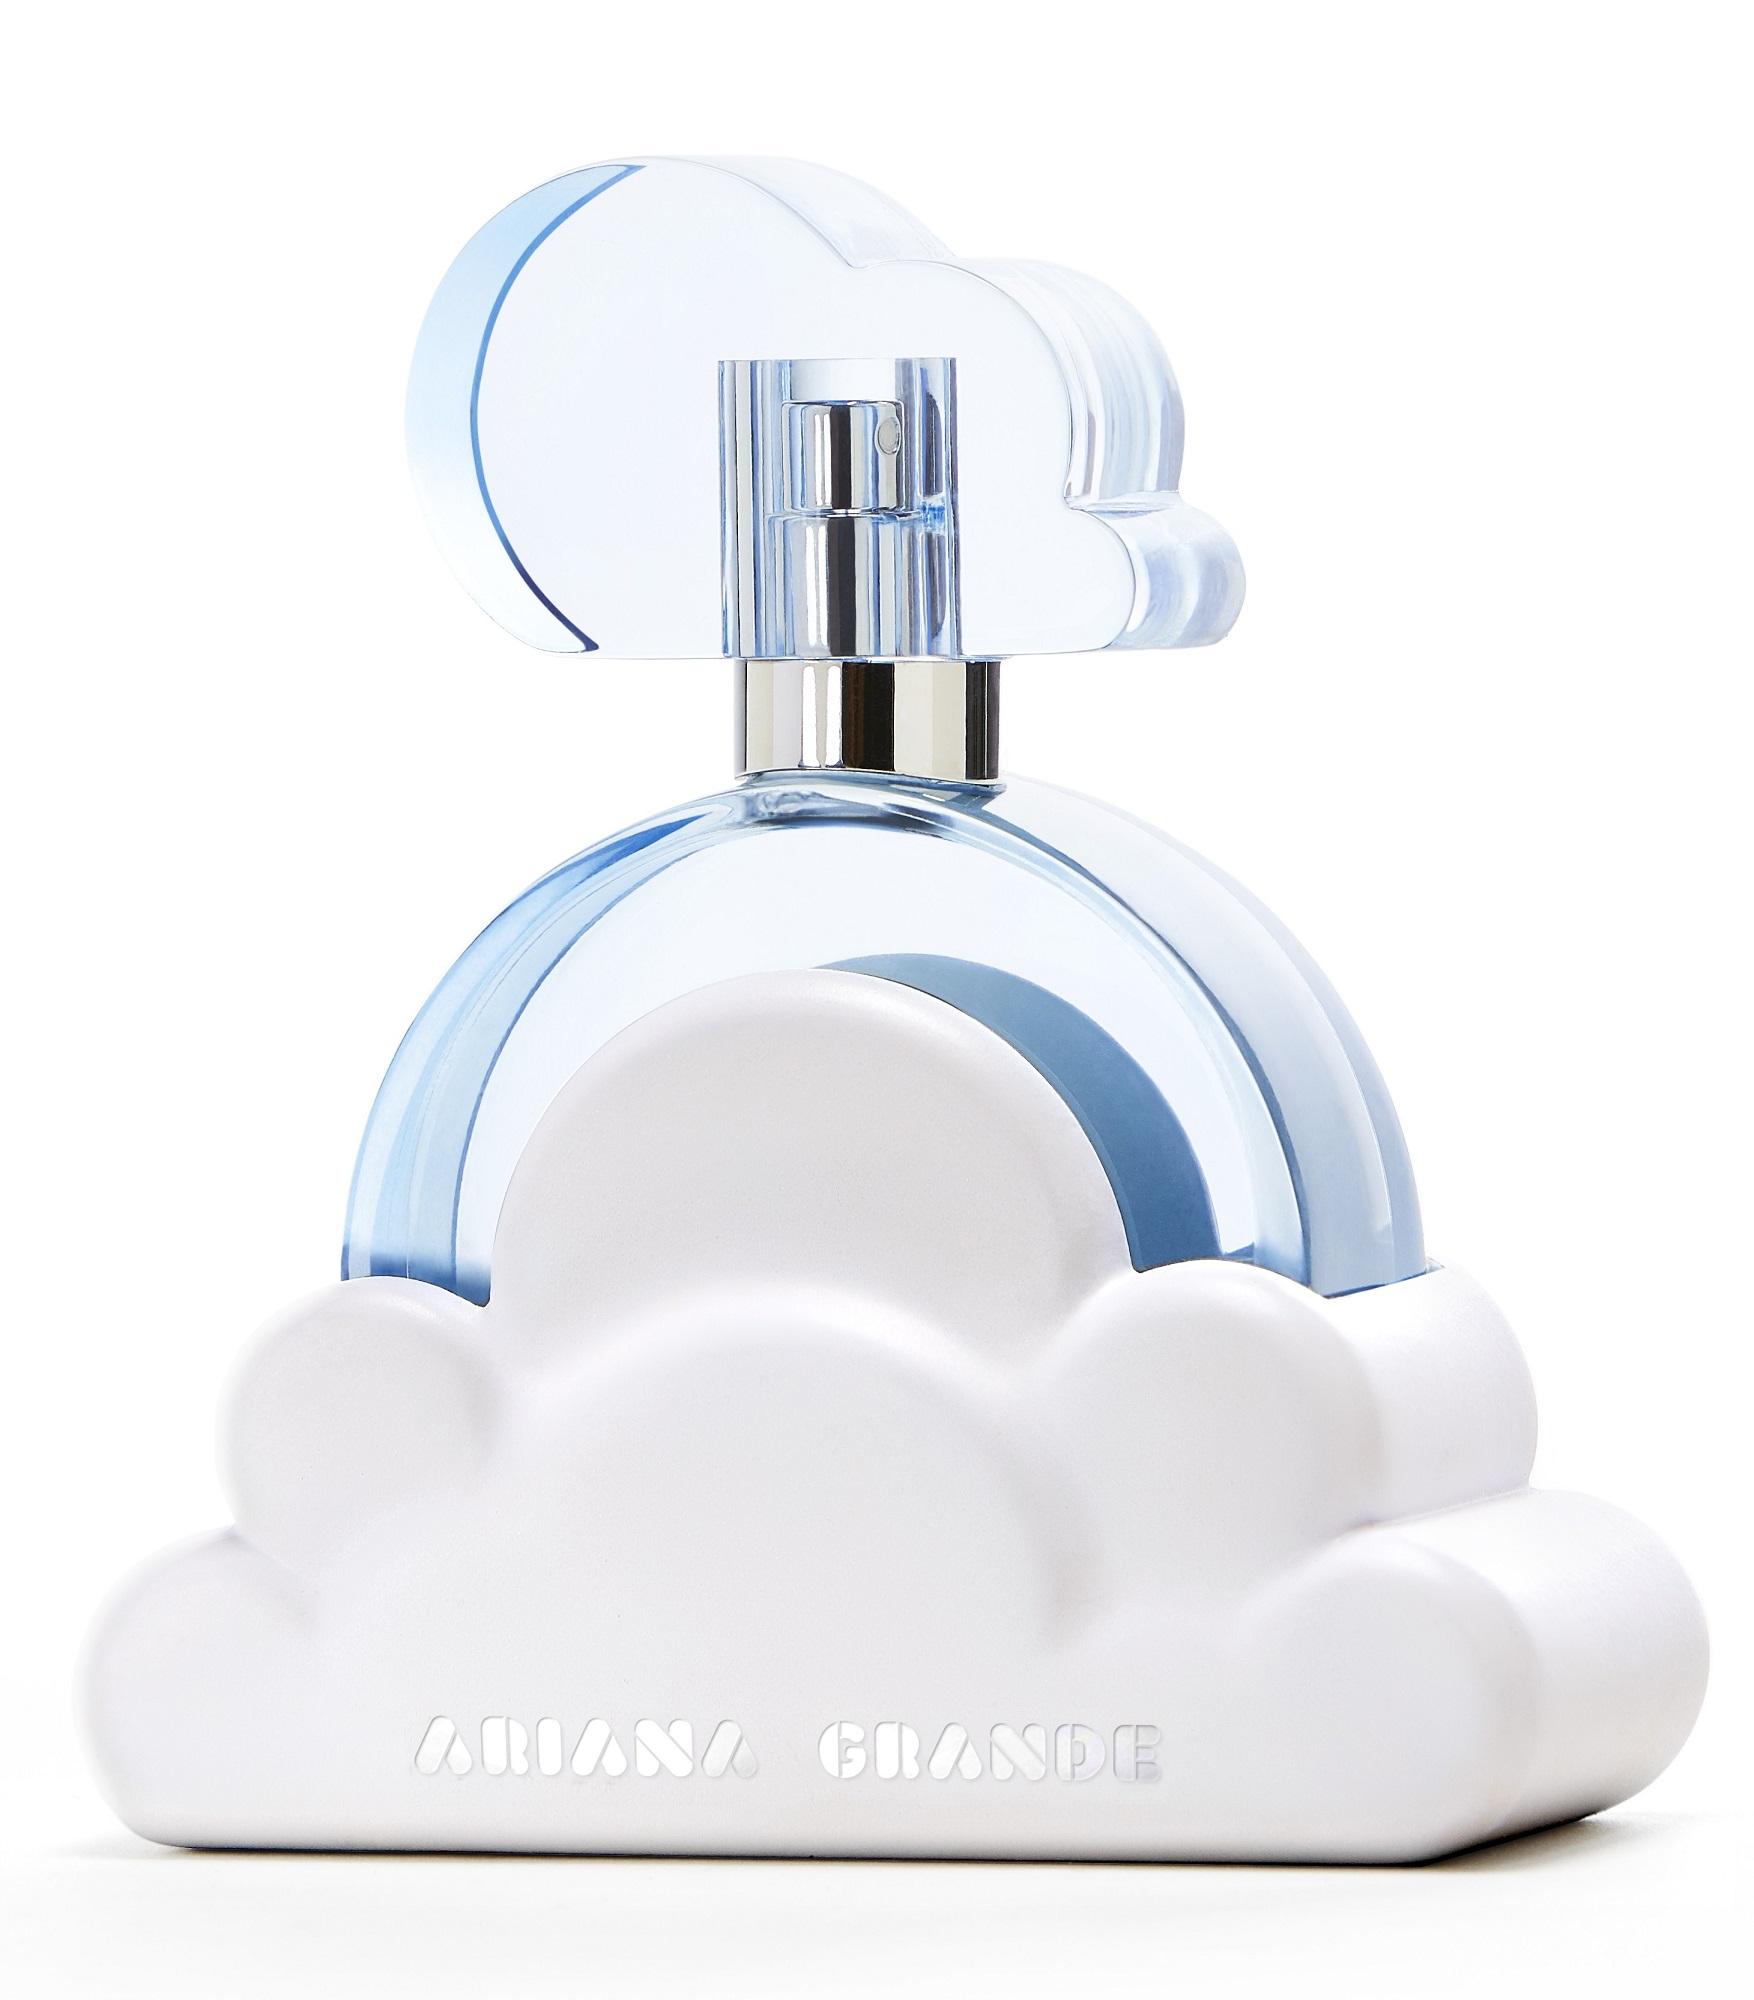 ariana grande cloud sweden